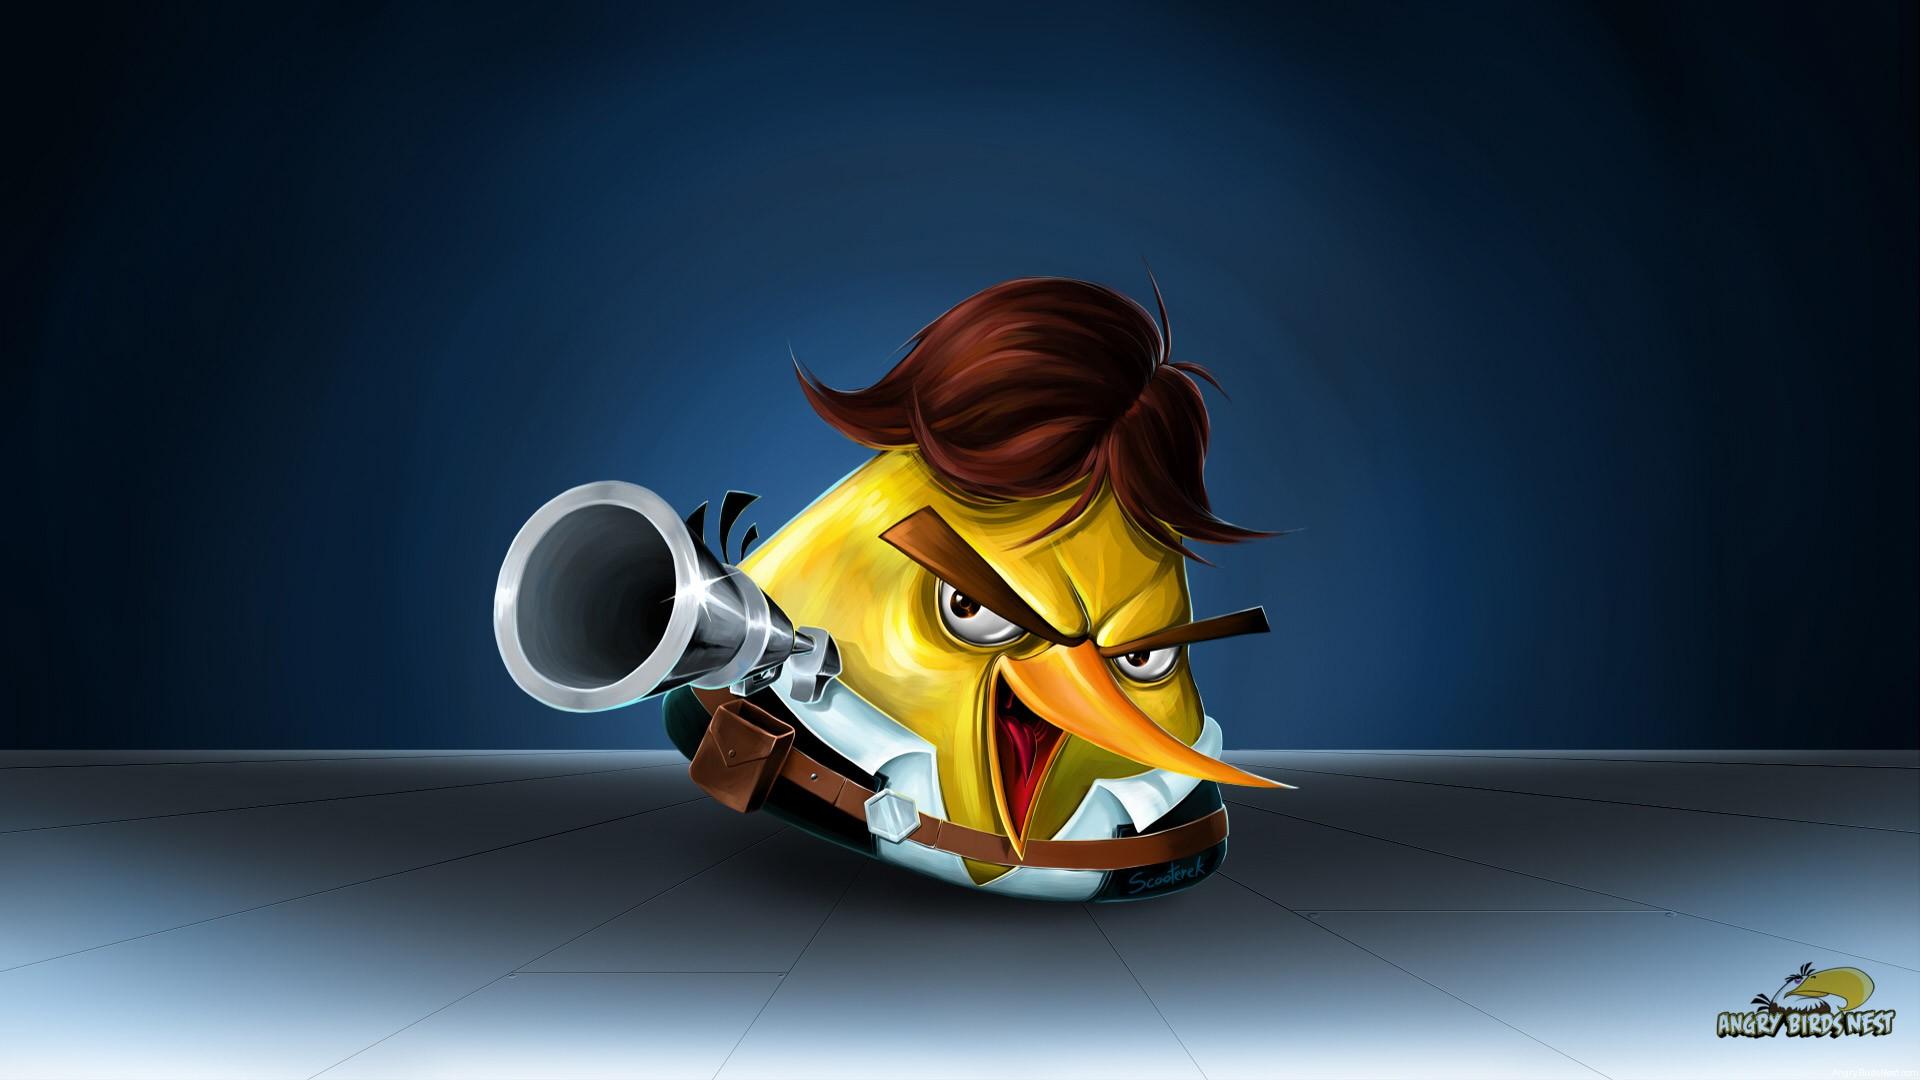 Angry Birds Star Wars Han Solo Desktop Wallpaper Alt Angrybirdsnest